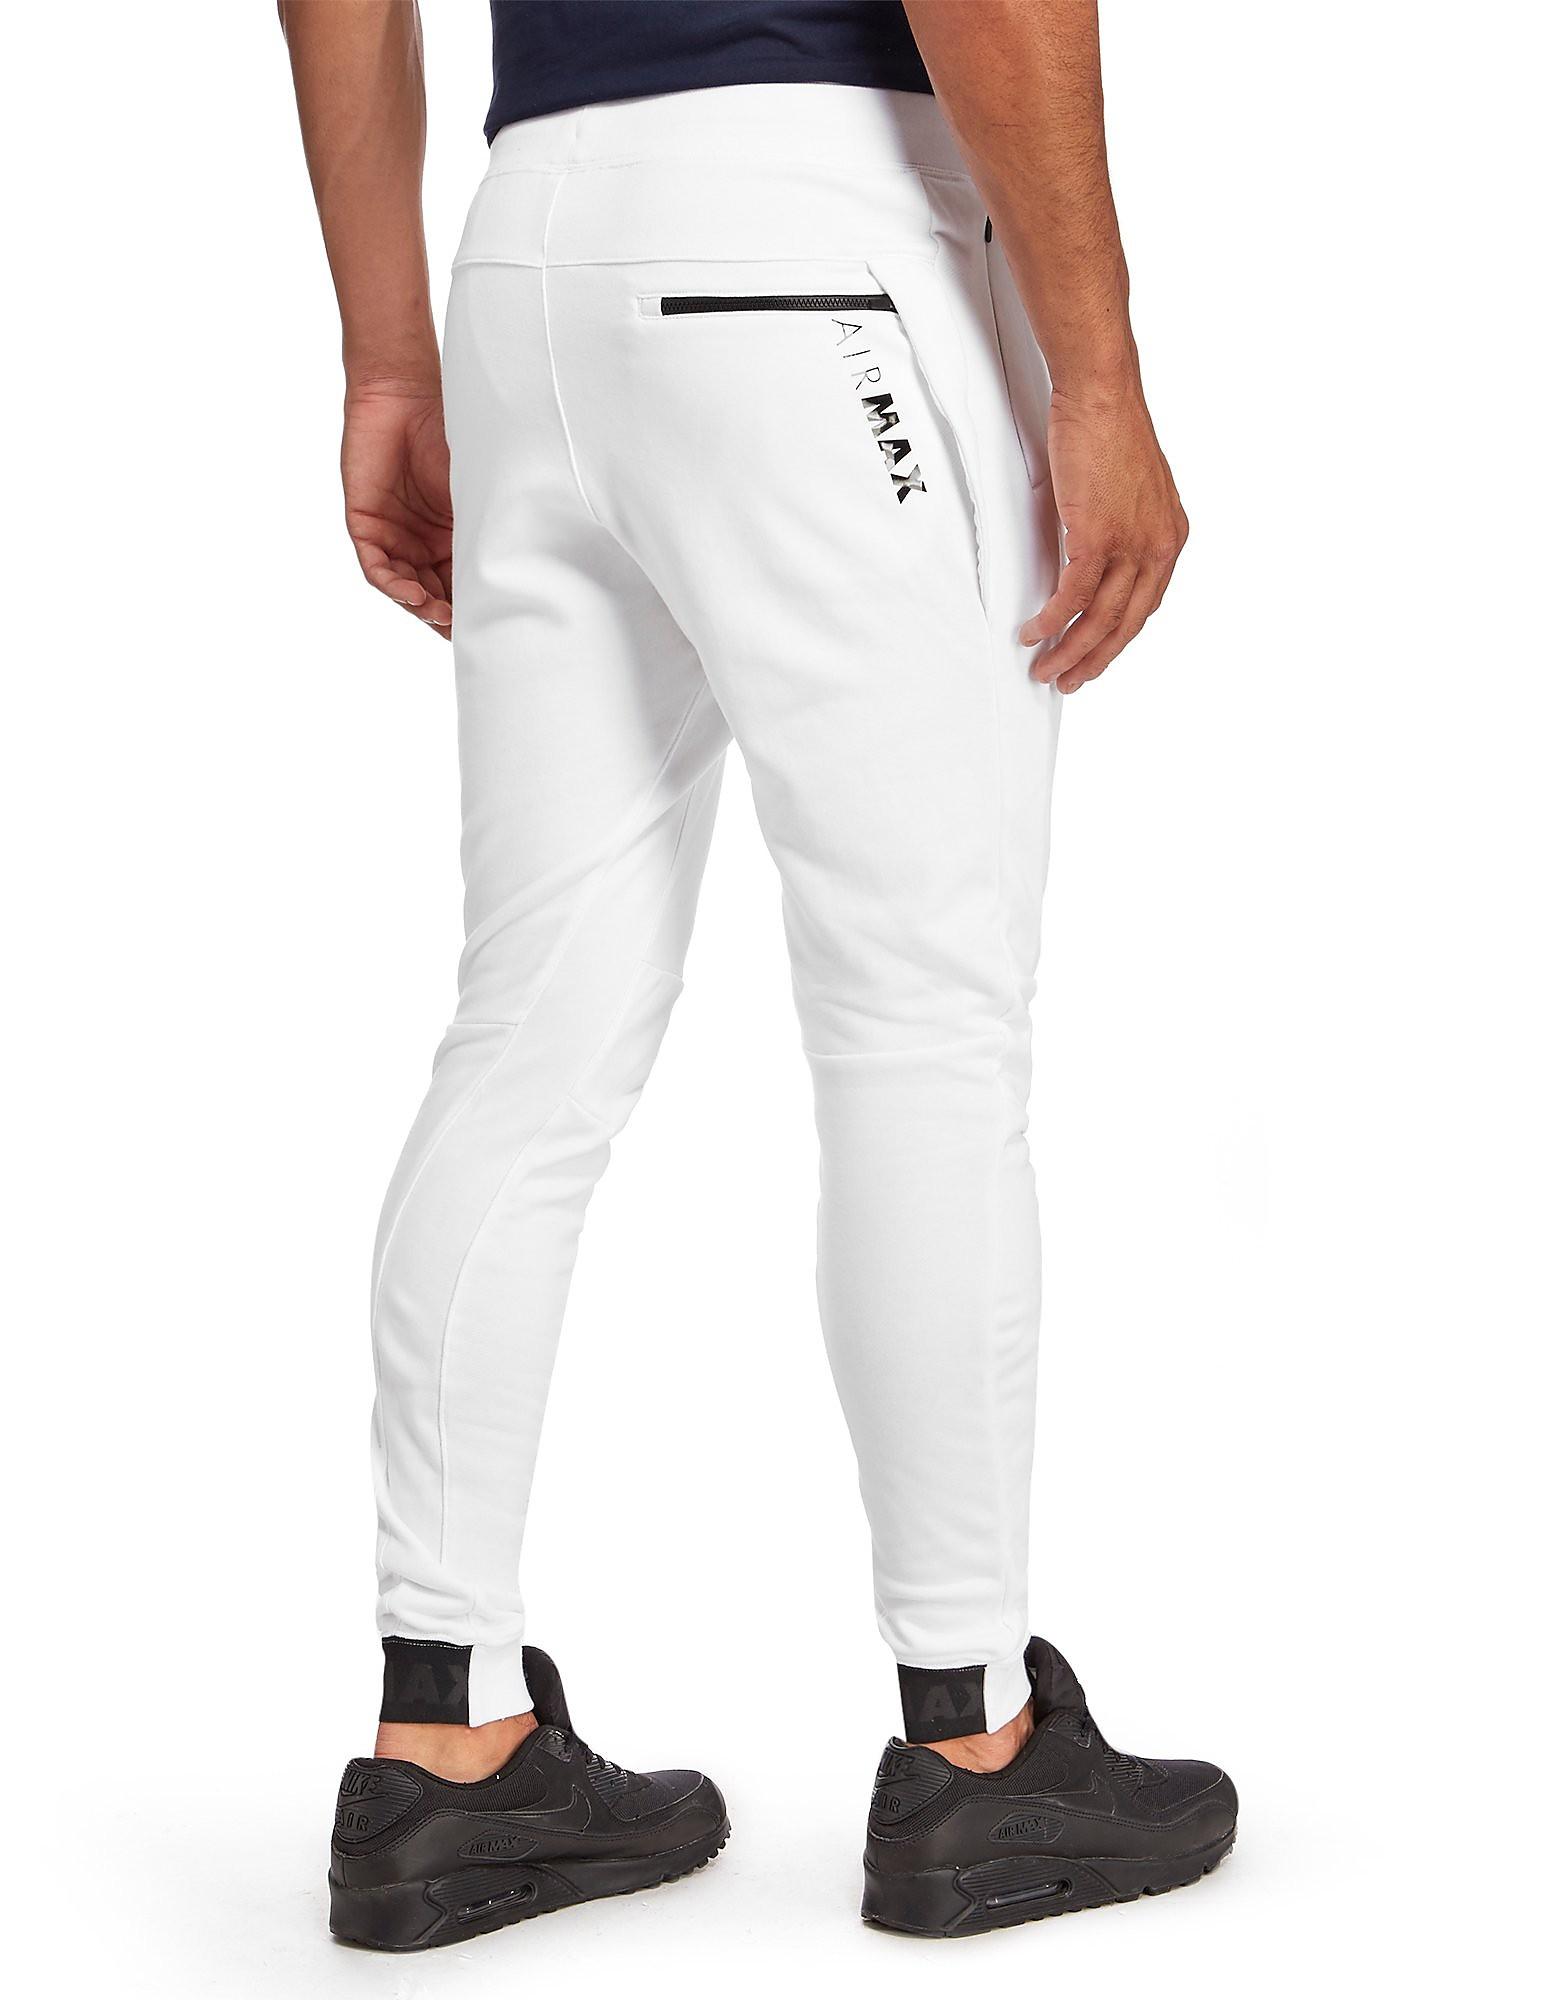 Nike Air Max Fleece Pants